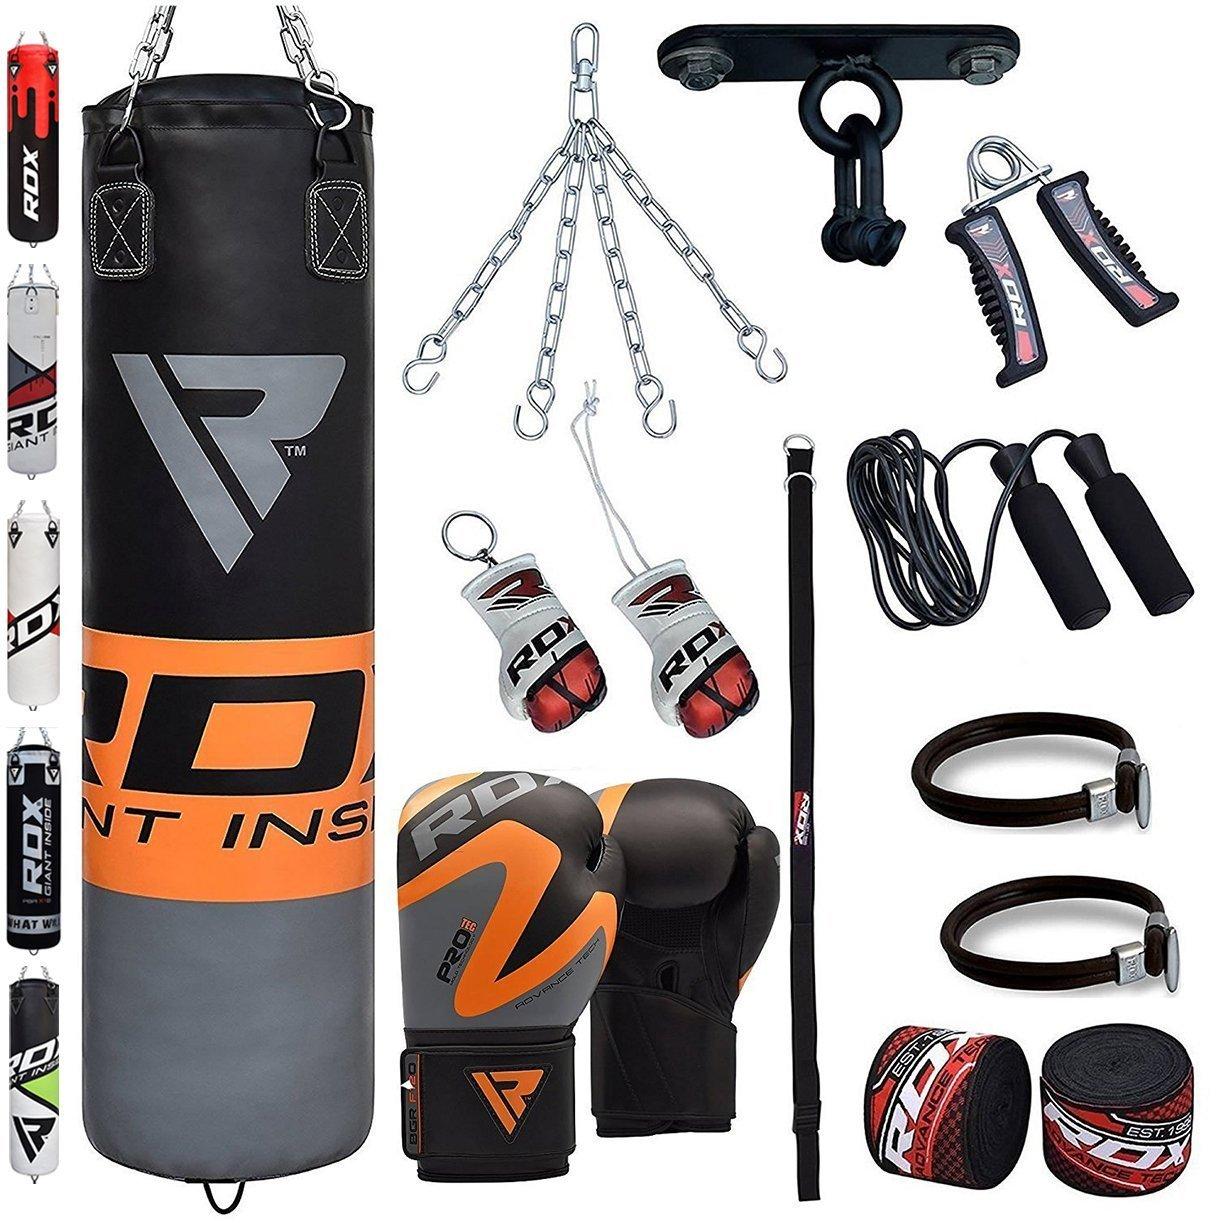 RDX Saco de Boxeo Relleno MMA Muay Thai Kick Boxing Artes Marciales Con Soporte Techo Guantes Cadena 13 PC 4FT 5FT Punching Bag ADIL0|#adidas